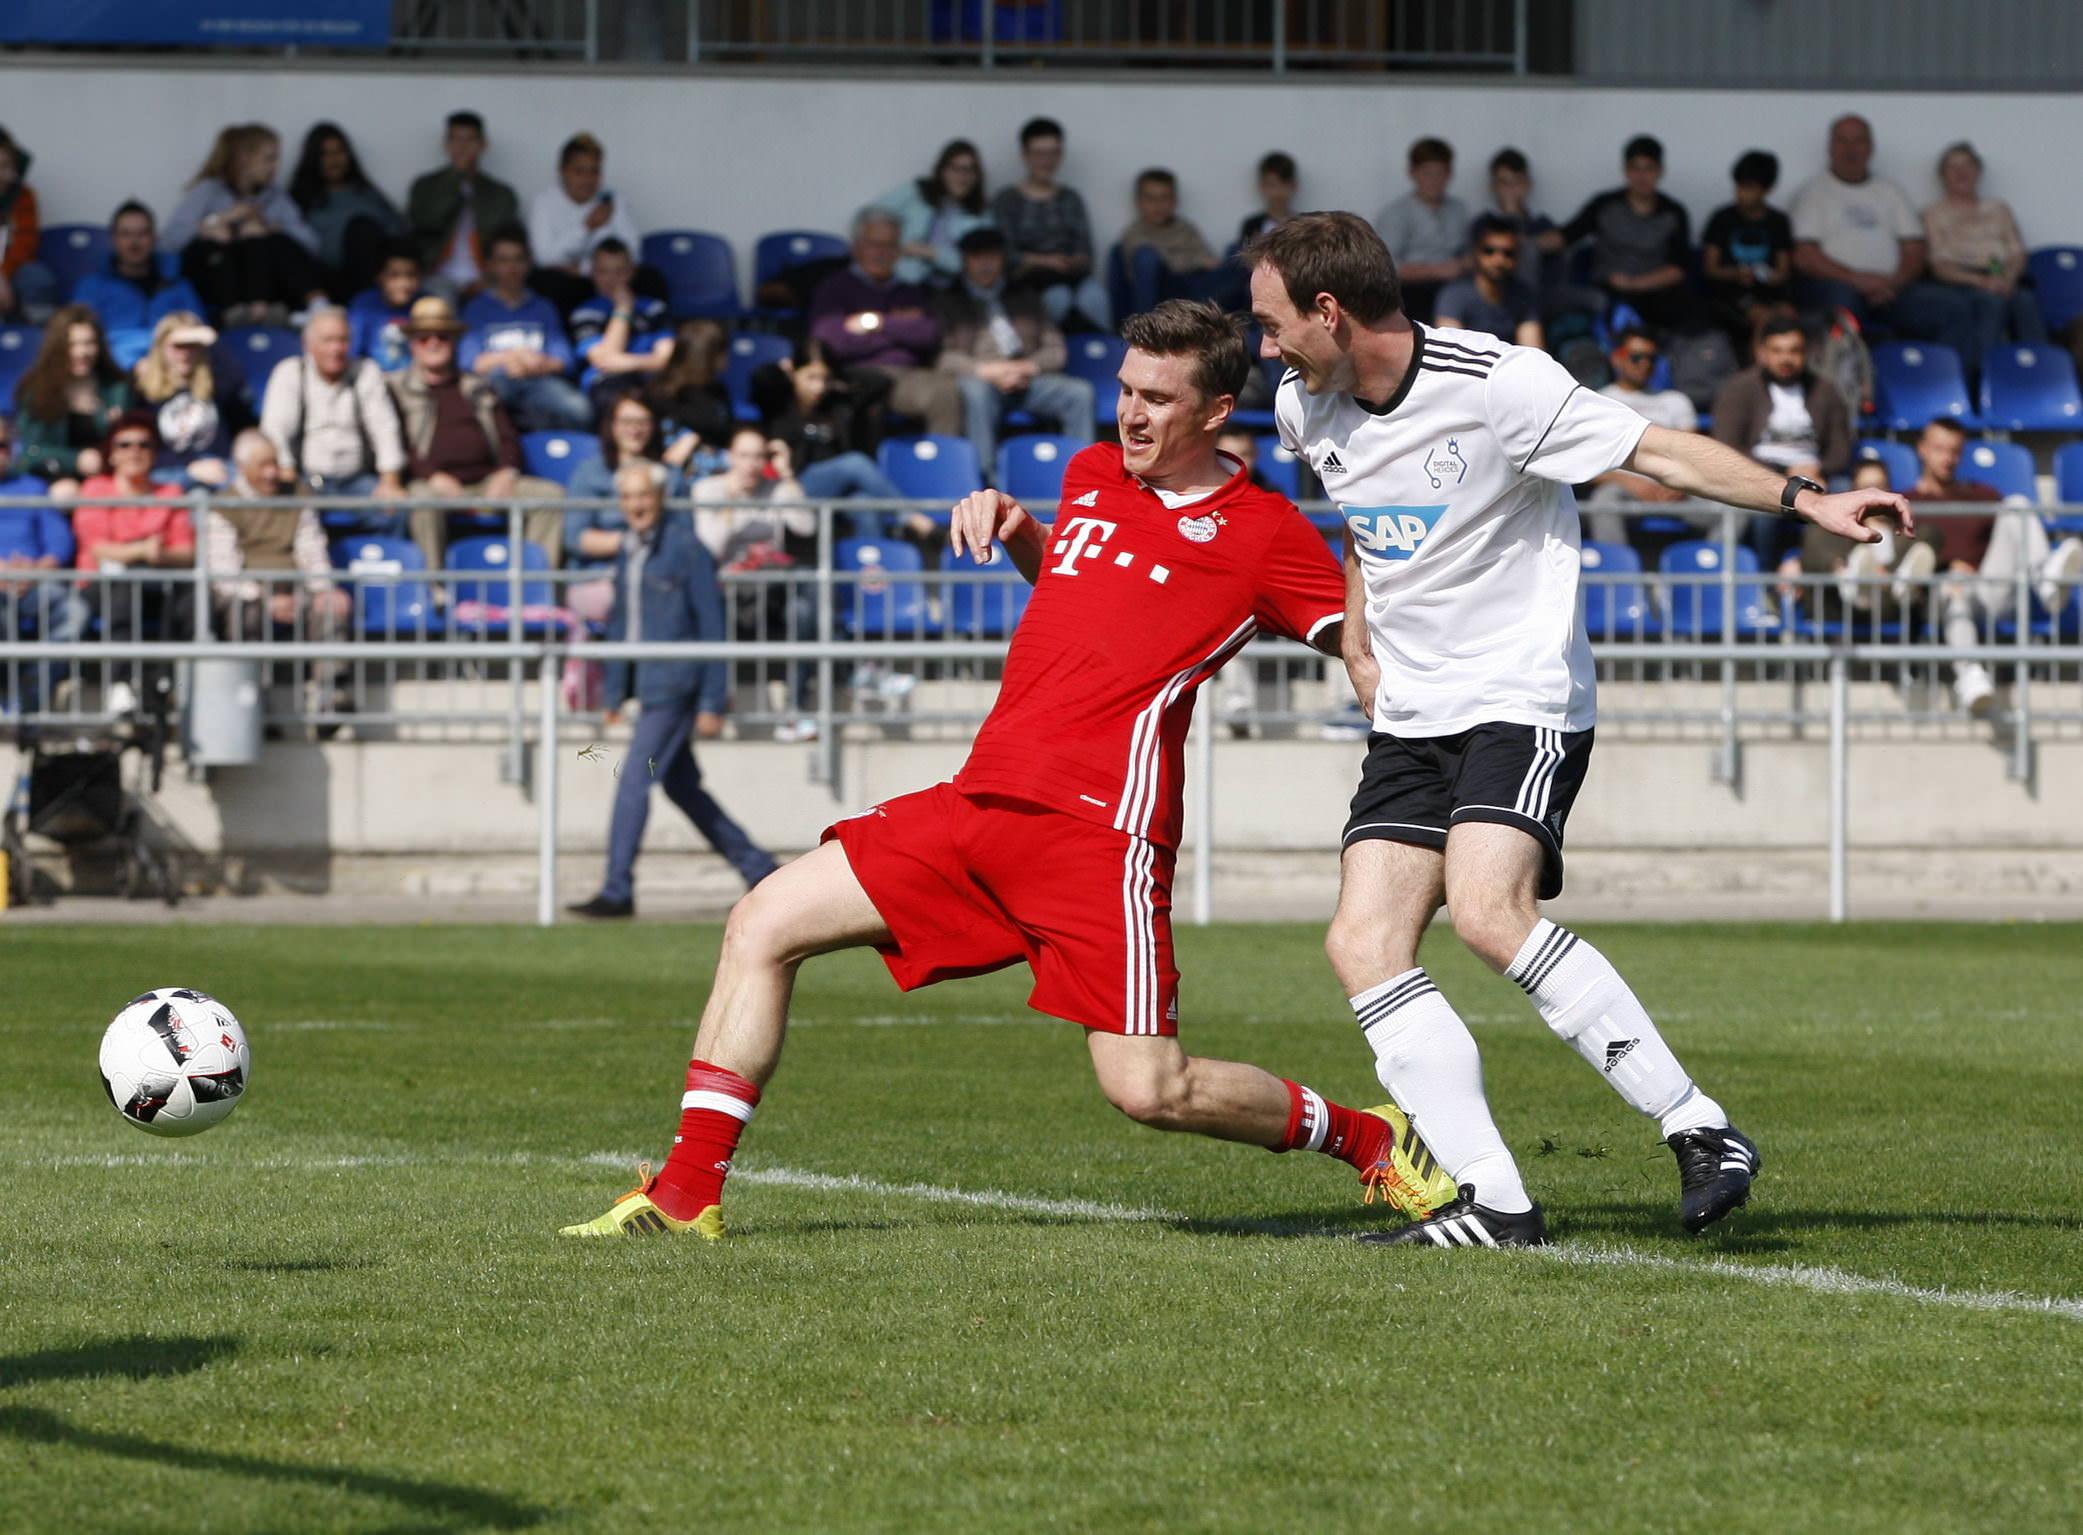 Fussball. Bayern Allstars - SAP Digital Heros. Tobias Schweinsteiger (Bayern Allstars). 05.04.2017 - Jan A. Pfeifer - 01726290959